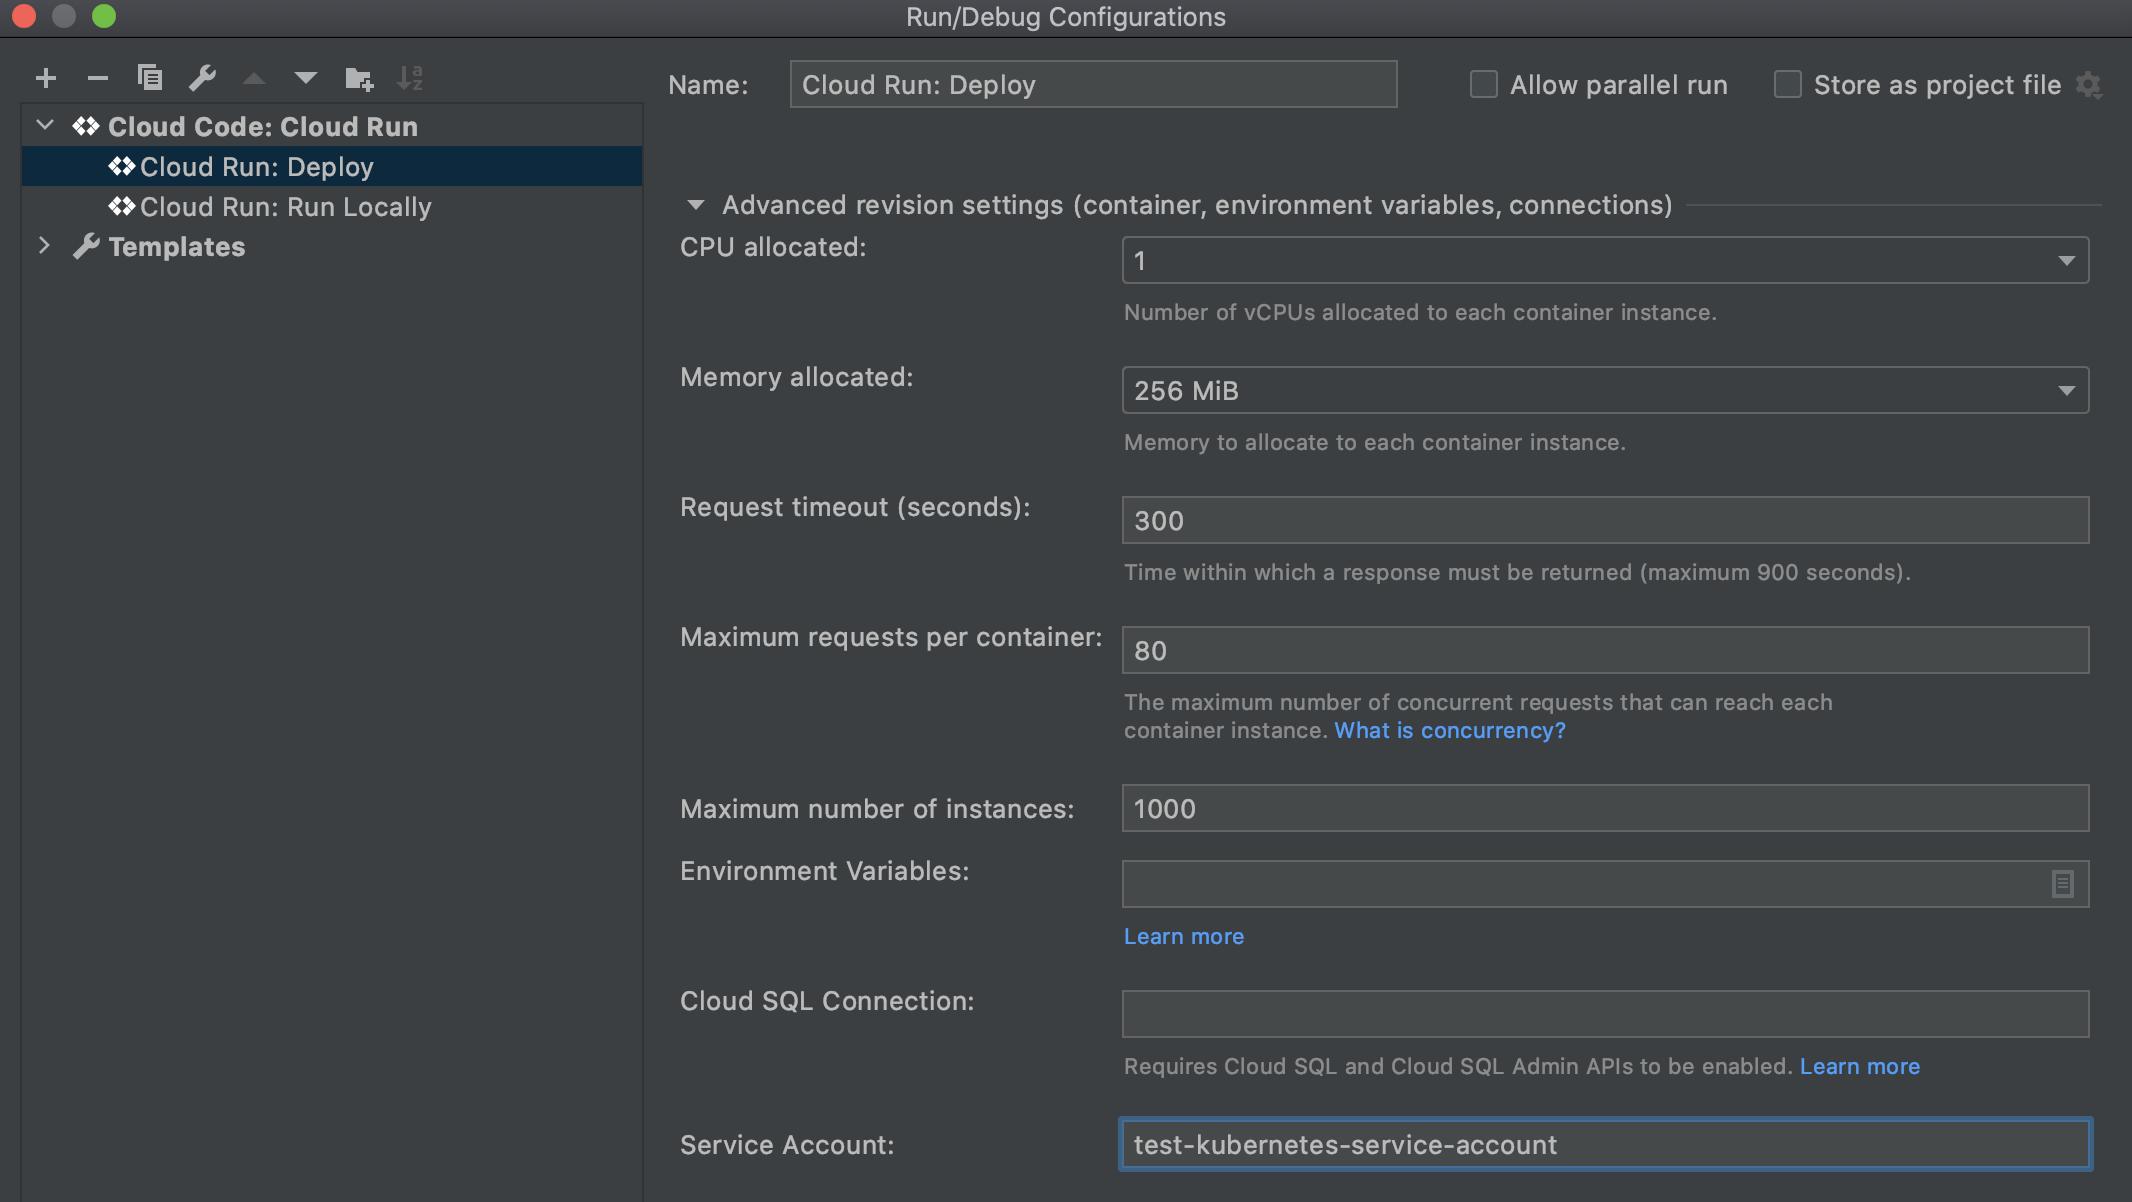 Cloud Run で展開された [Advanced revision settings] セクション: Kubernetes サービス アカウント名が入力された [Deploy and Service Account] フィールド